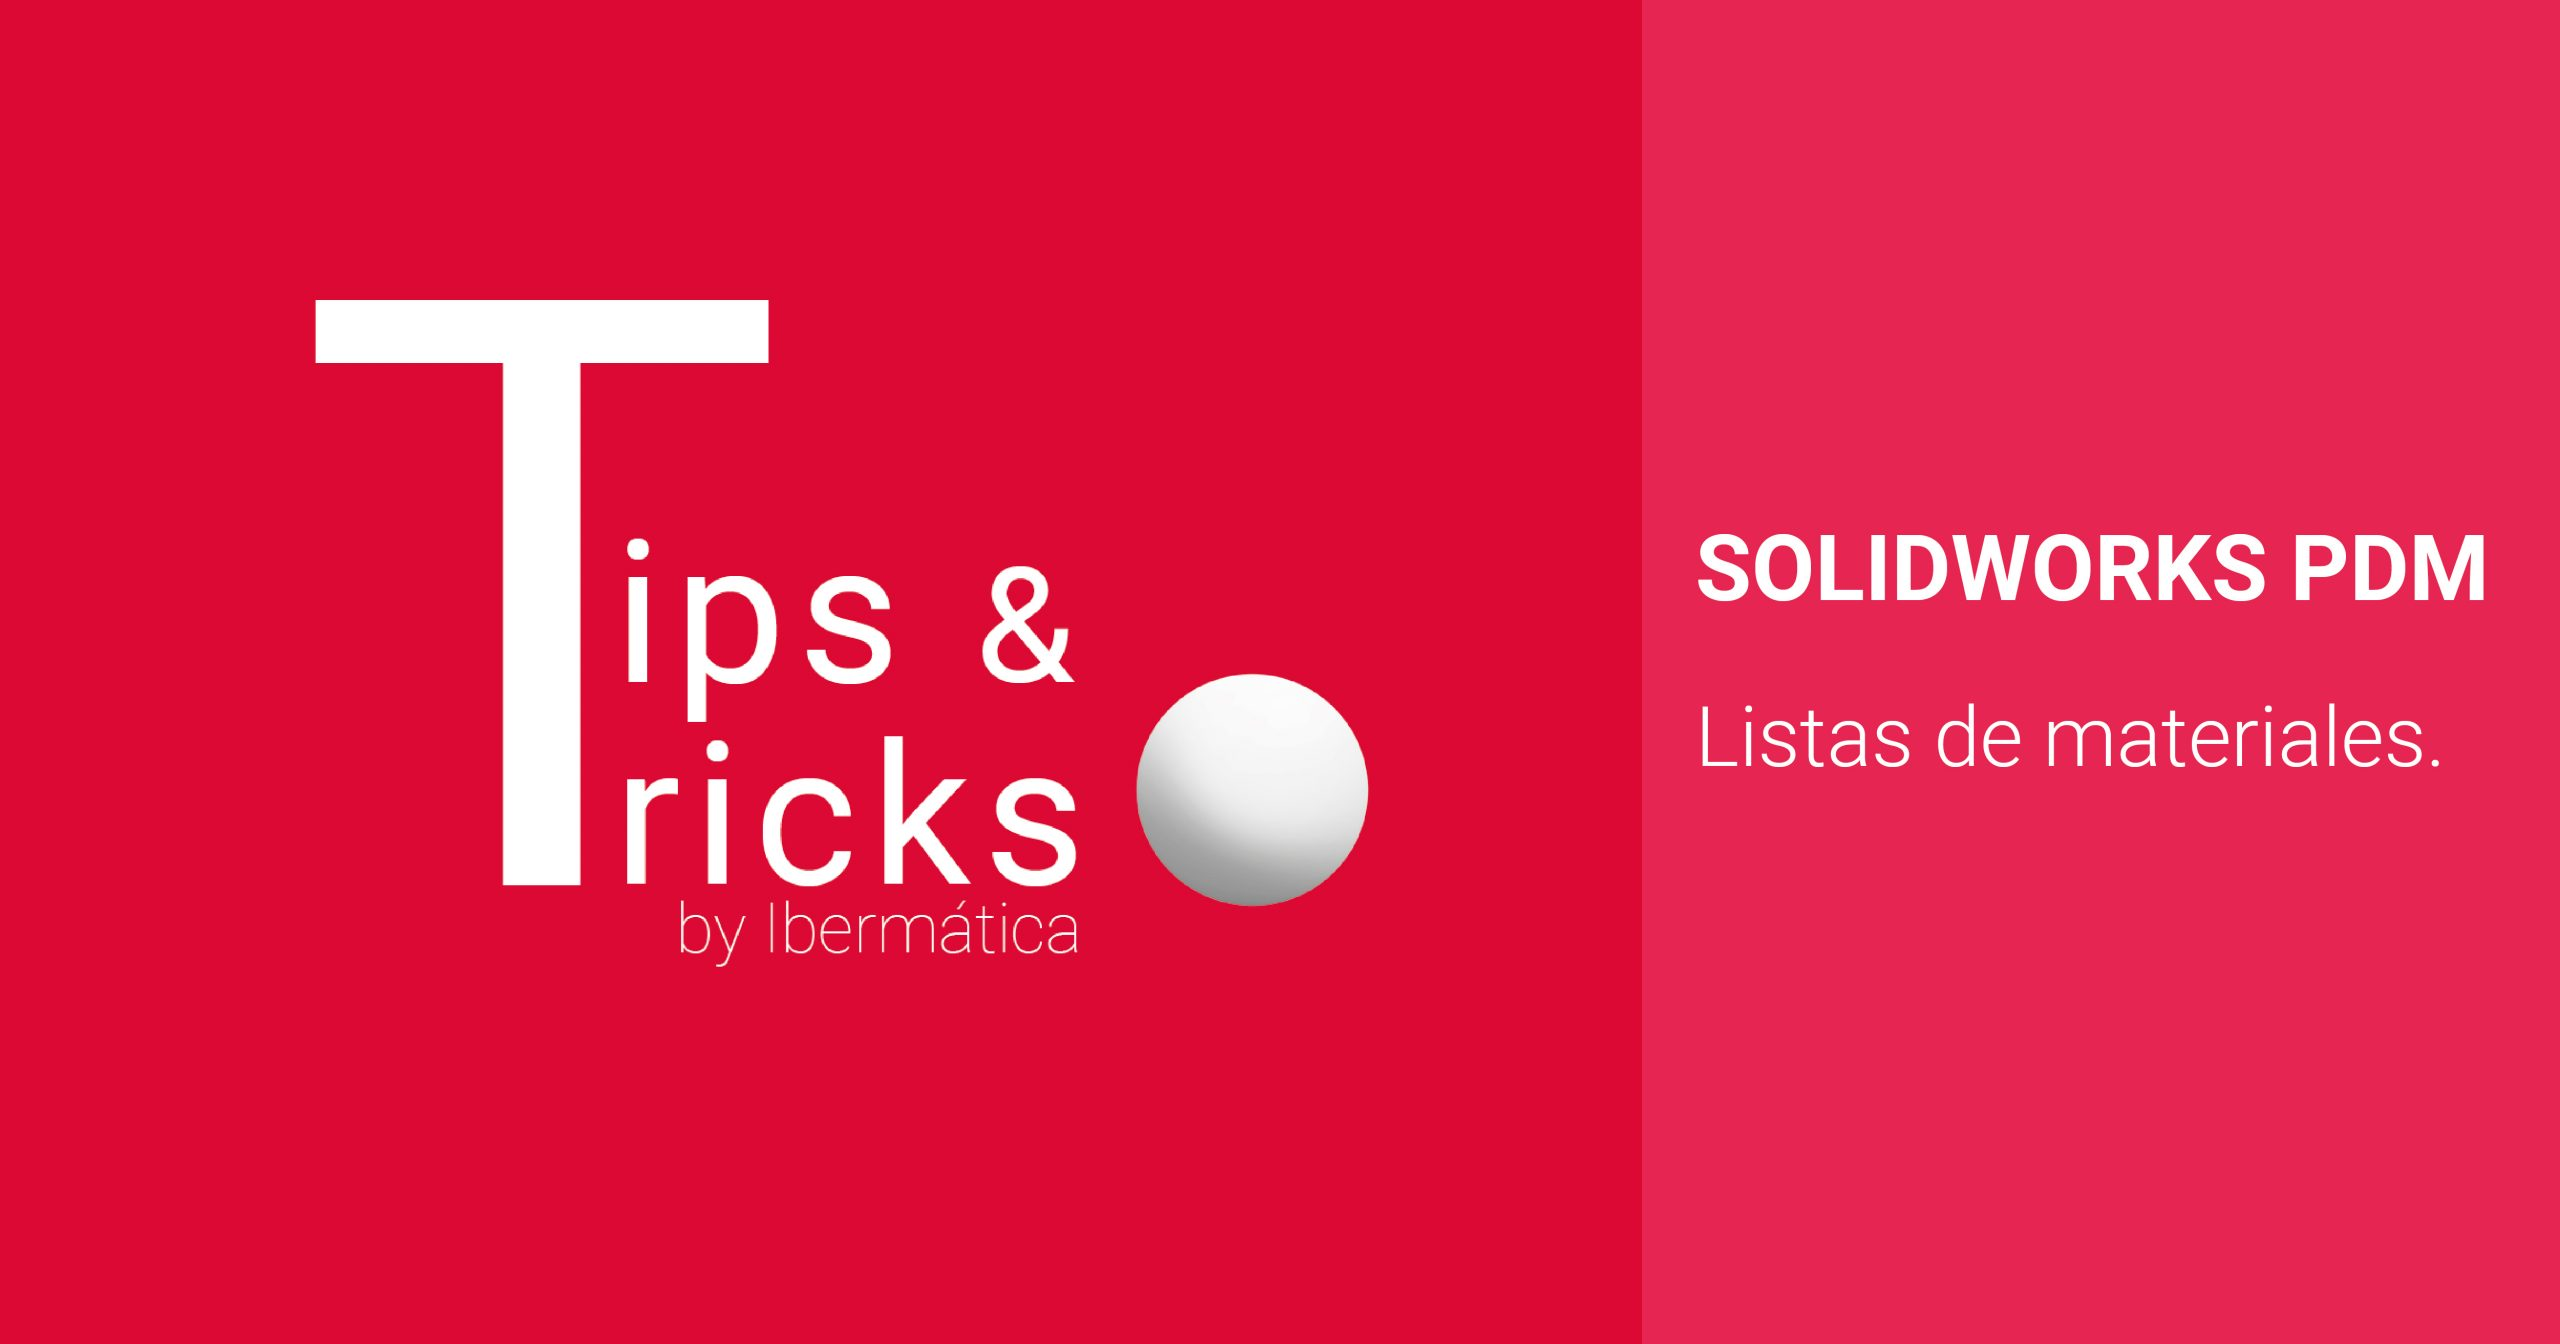 lista de materiales solidworks